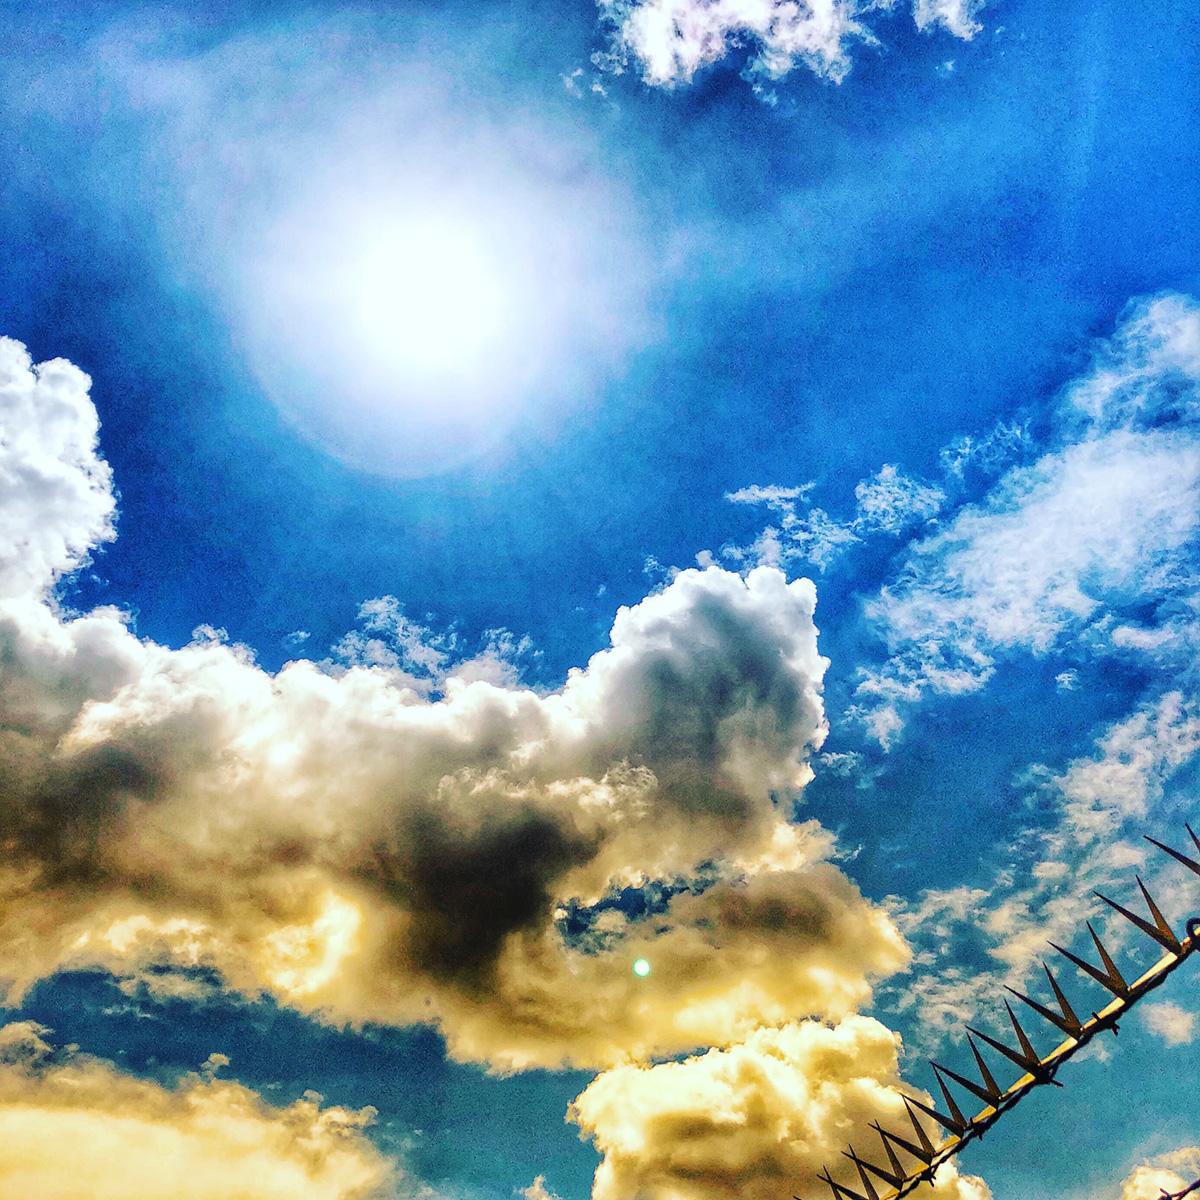 Cloudy Sky Through the Barbs 2